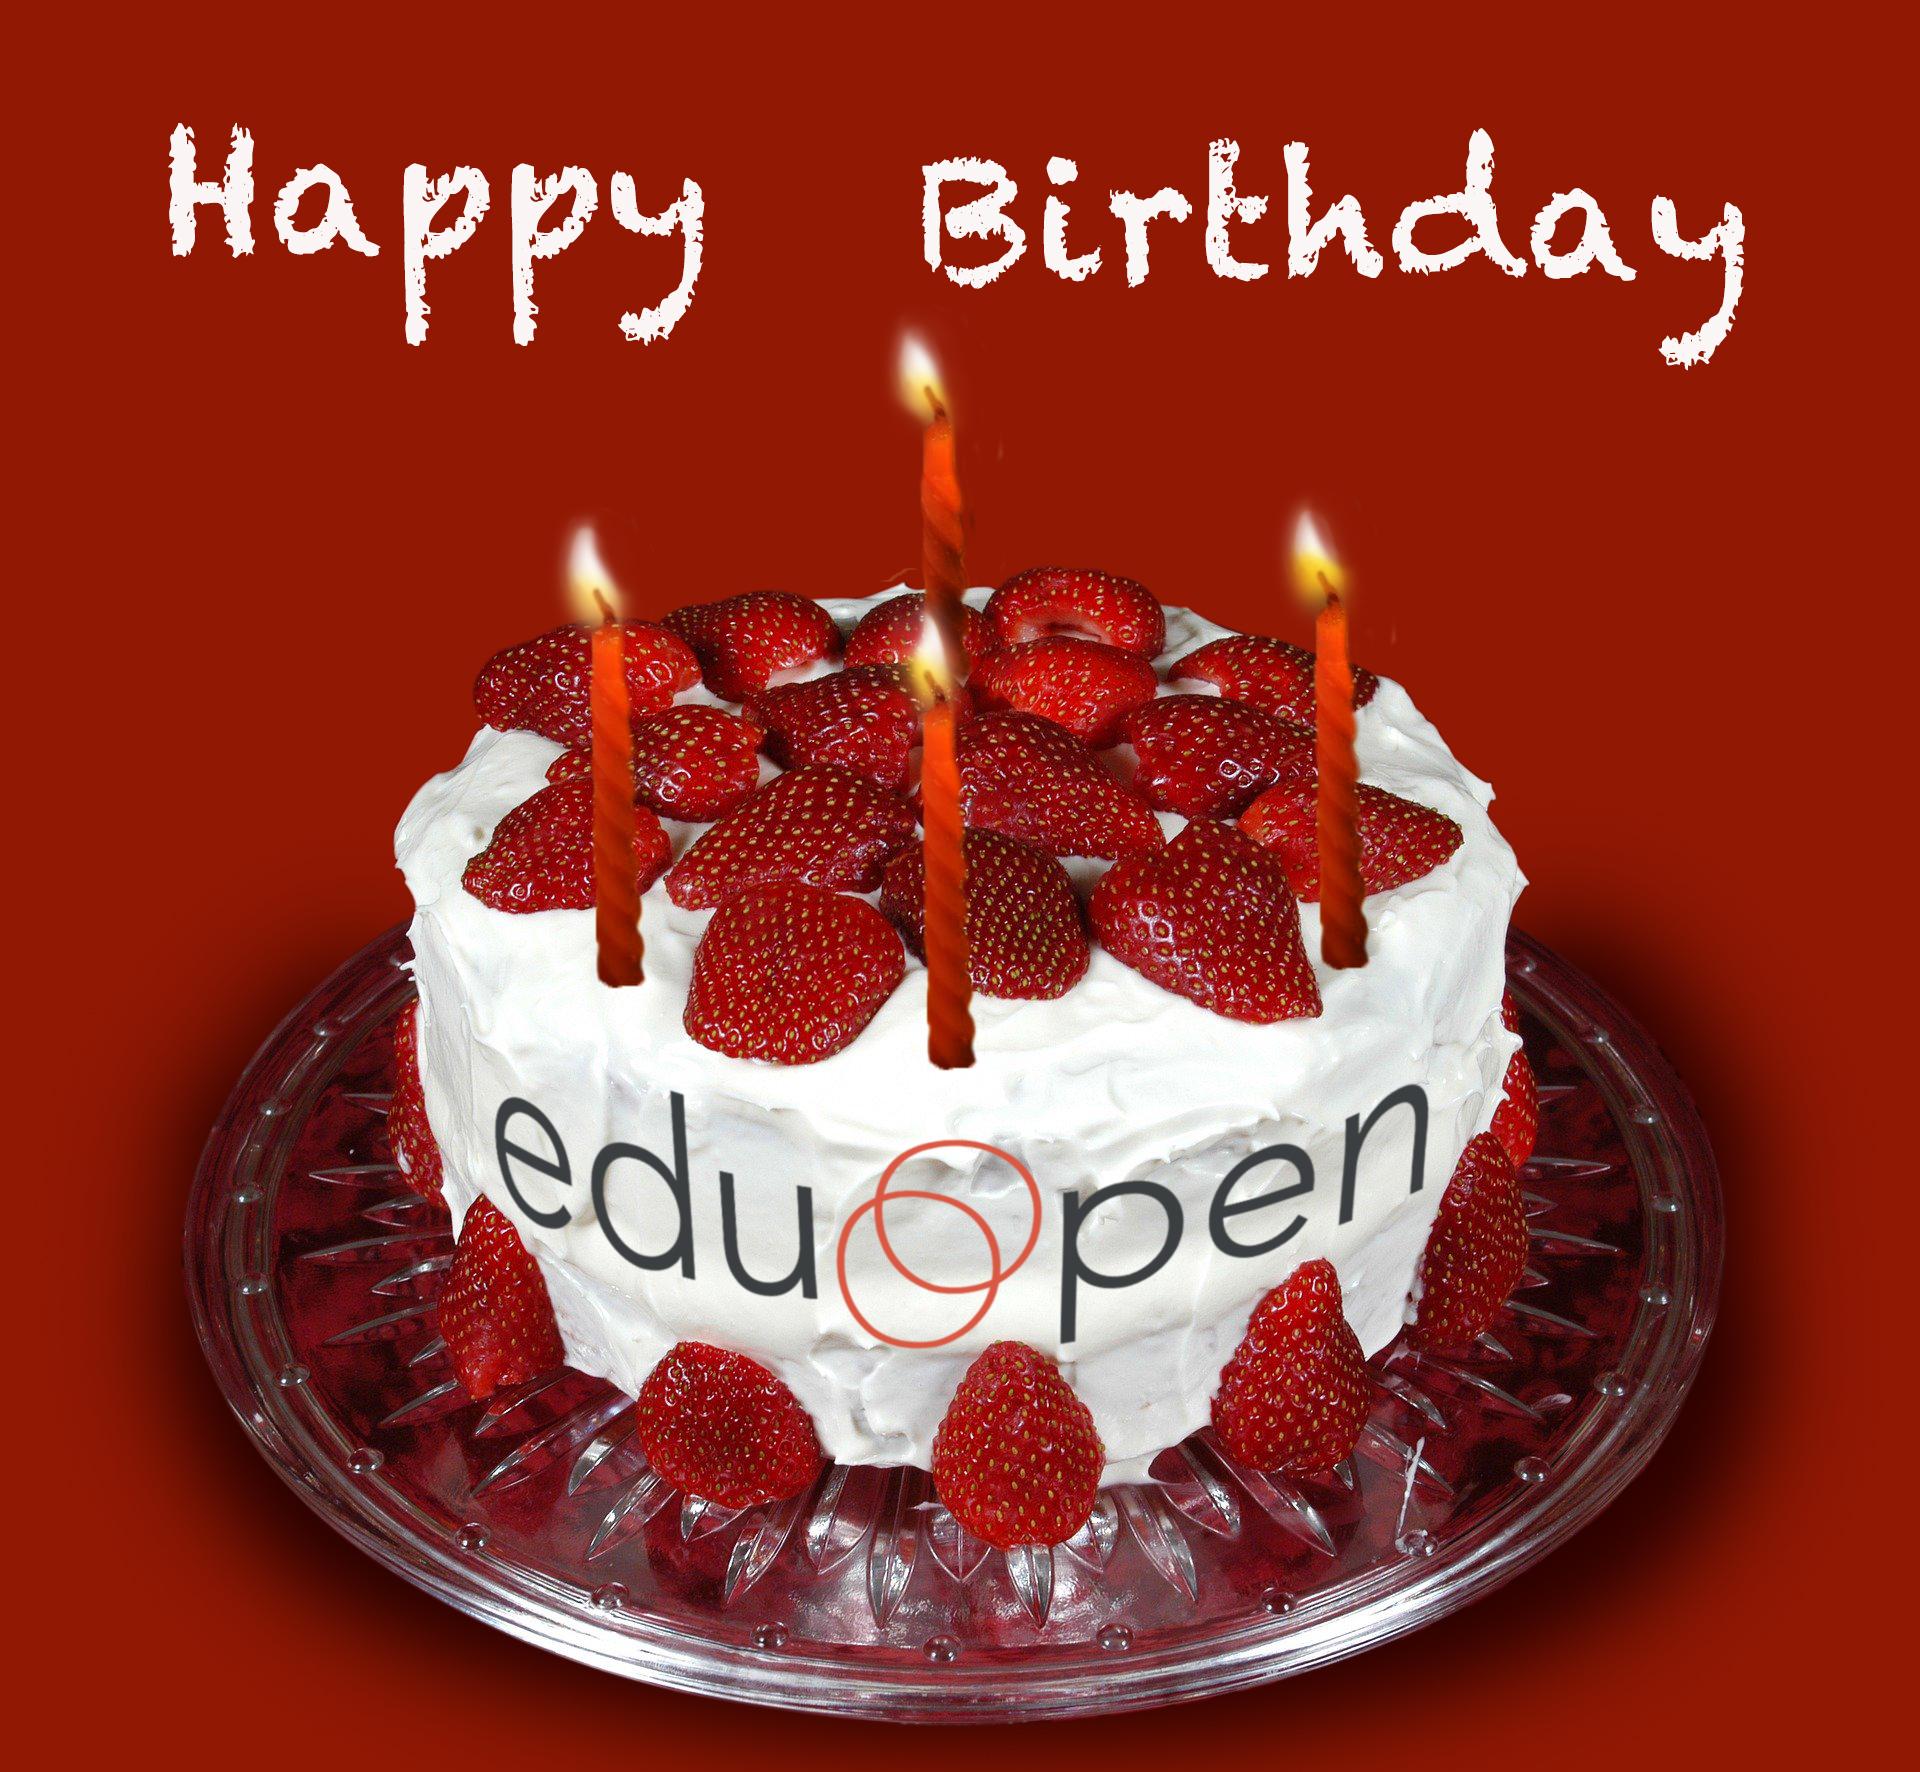 EduOpen birthday cake